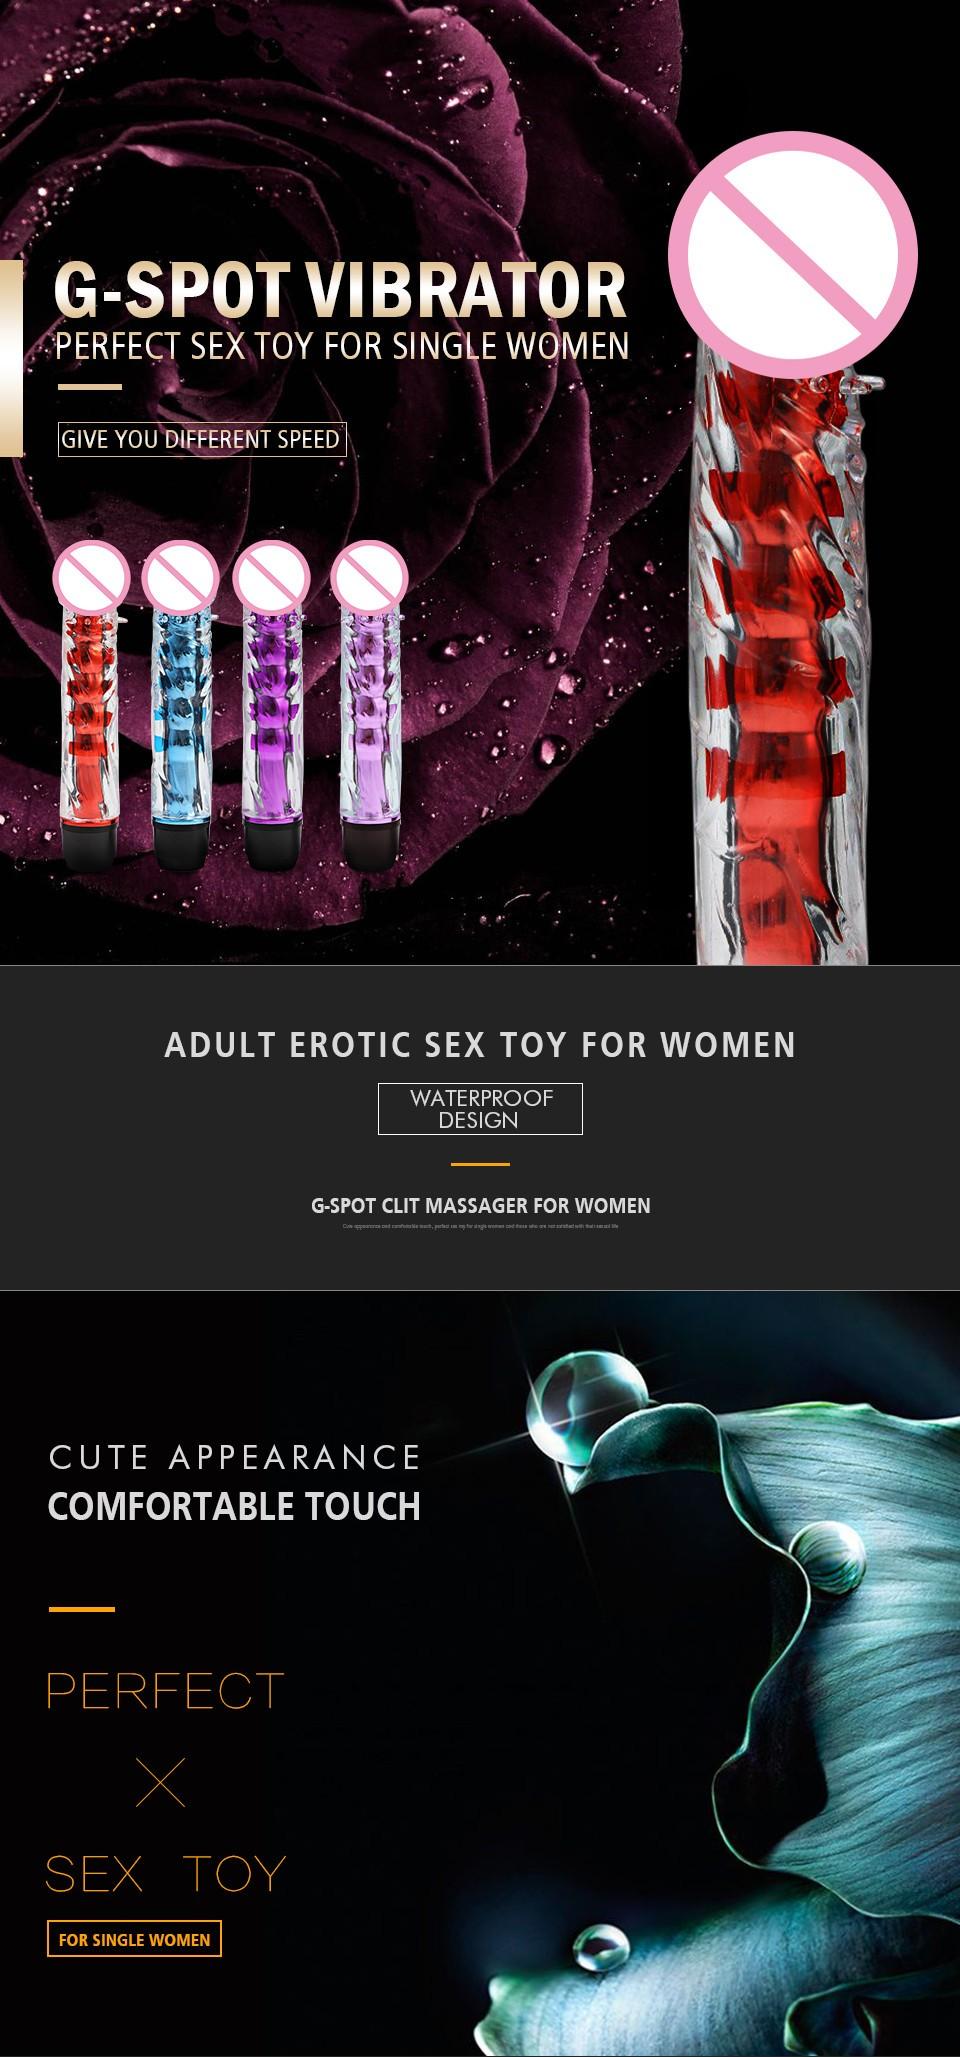 HTB1hciWKFXXXXc.aXXXq6xXFXXXj - Multi Speed Silicone G Spot Classic Vibrator 7 Inches Sex Toy